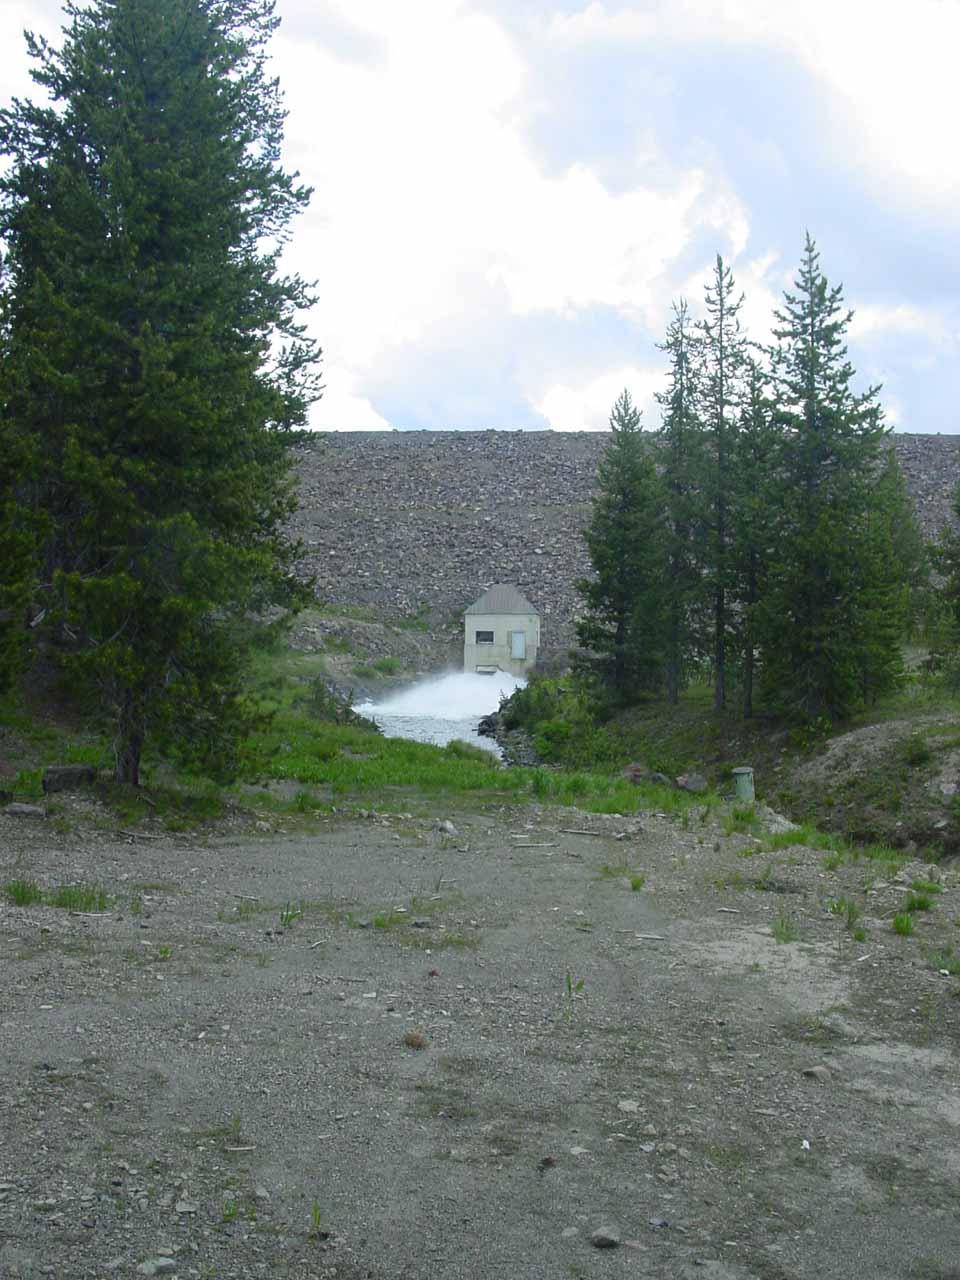 Grassy Lake Reservoir